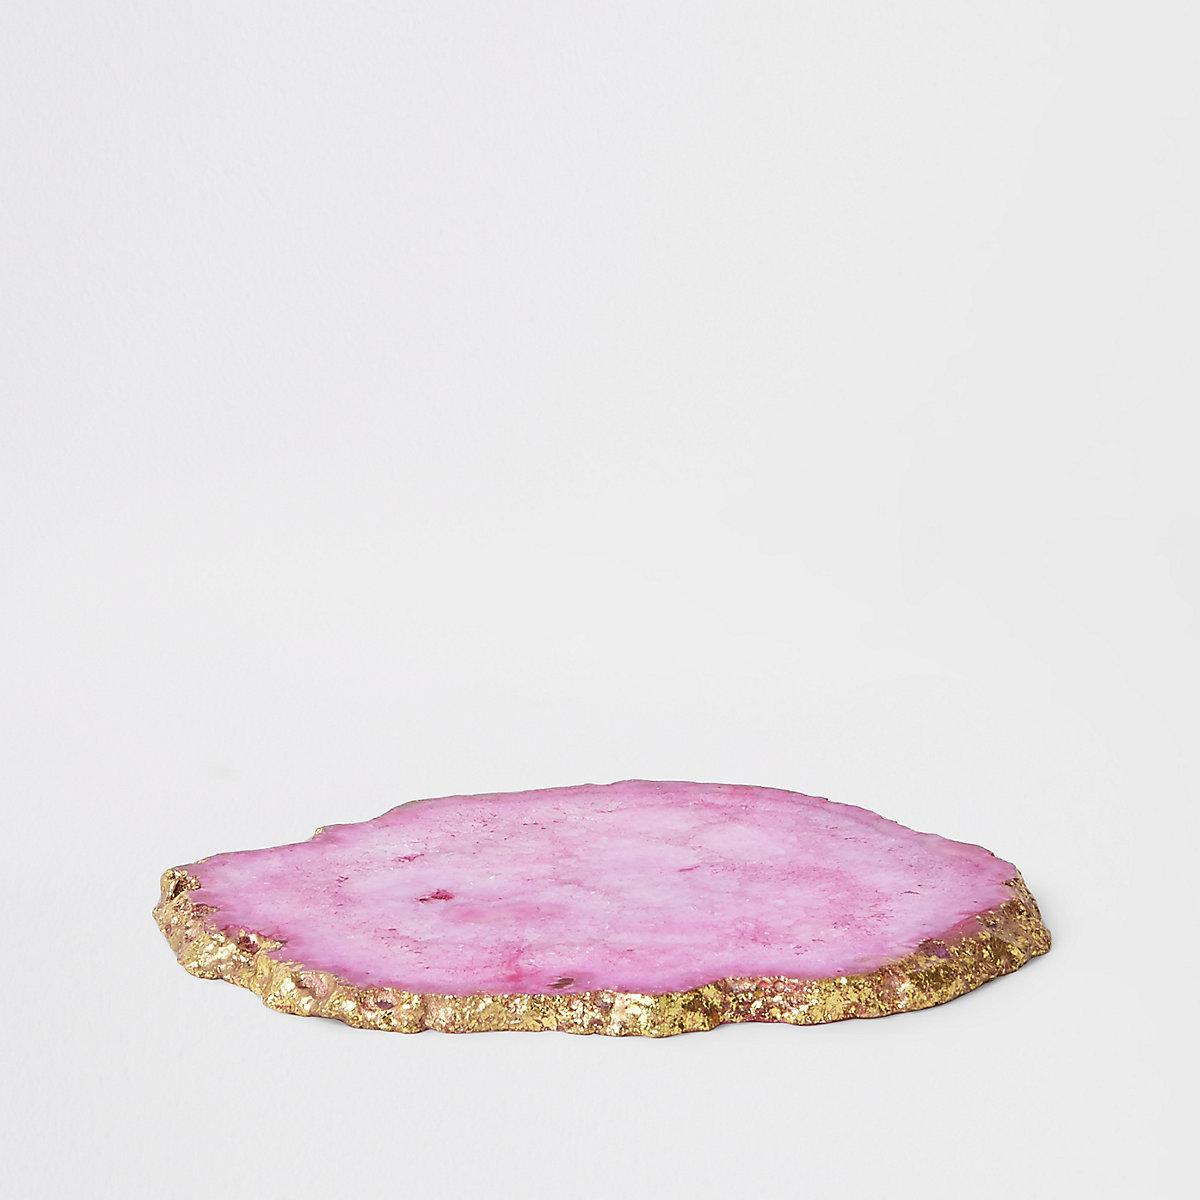 Pink agate coaster